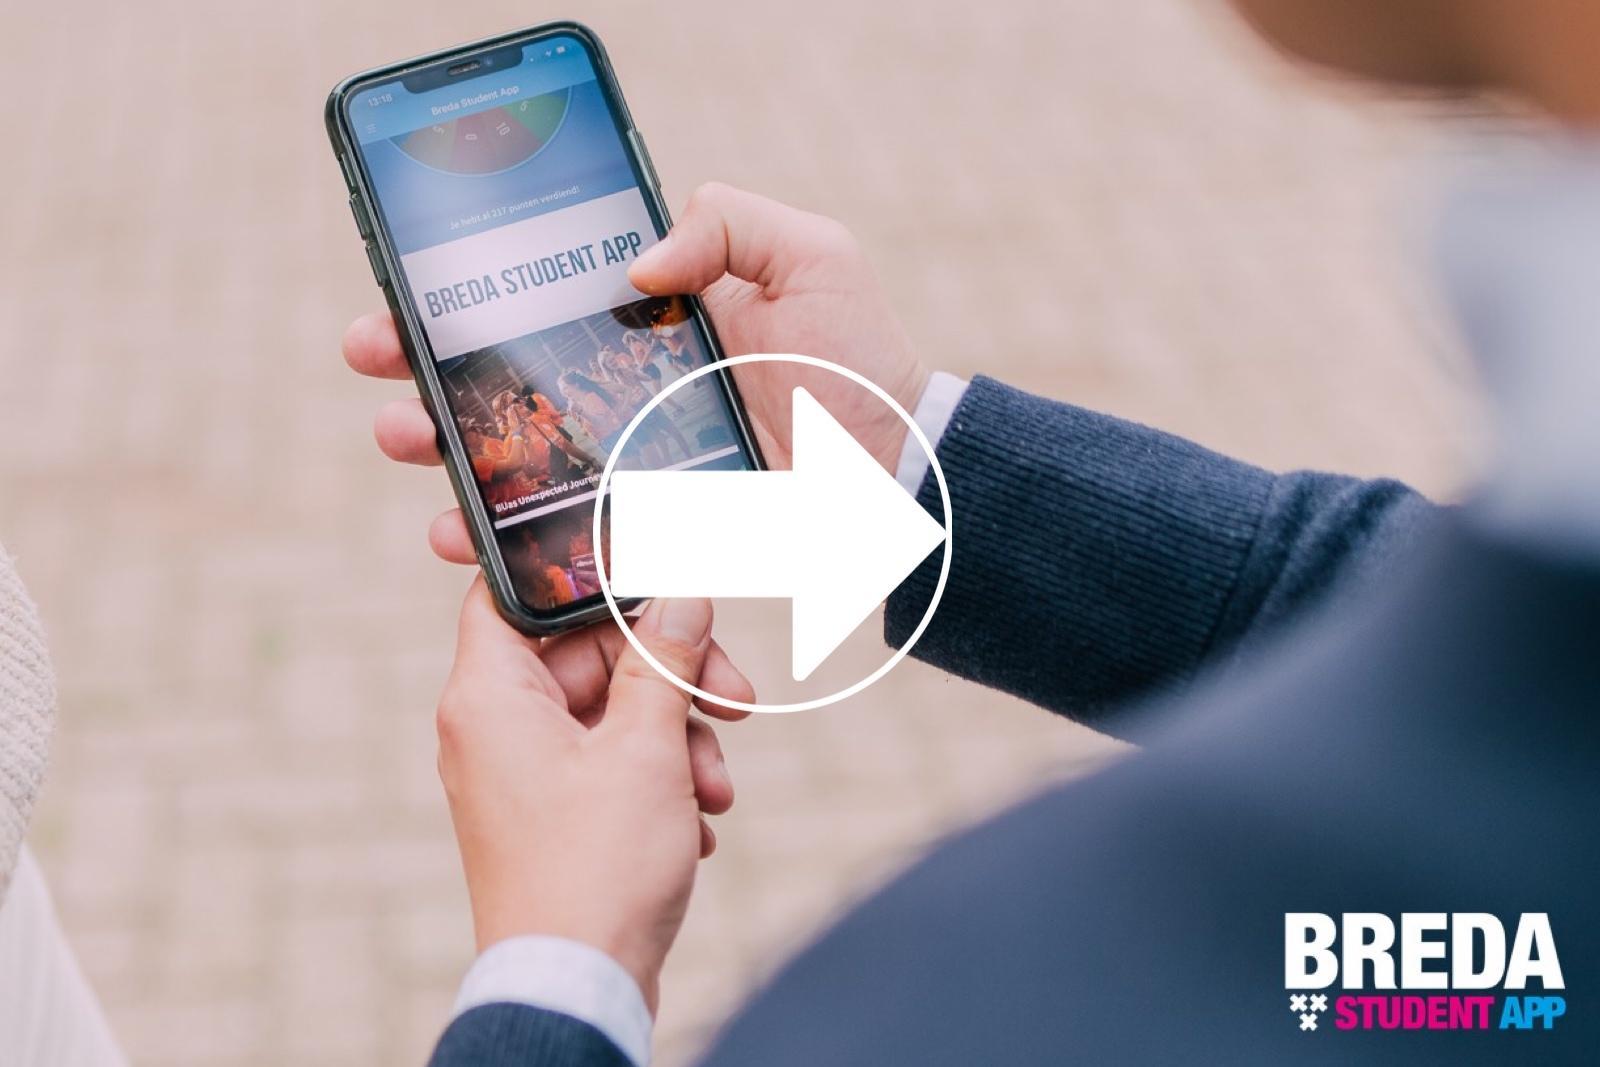 Breda Student App video